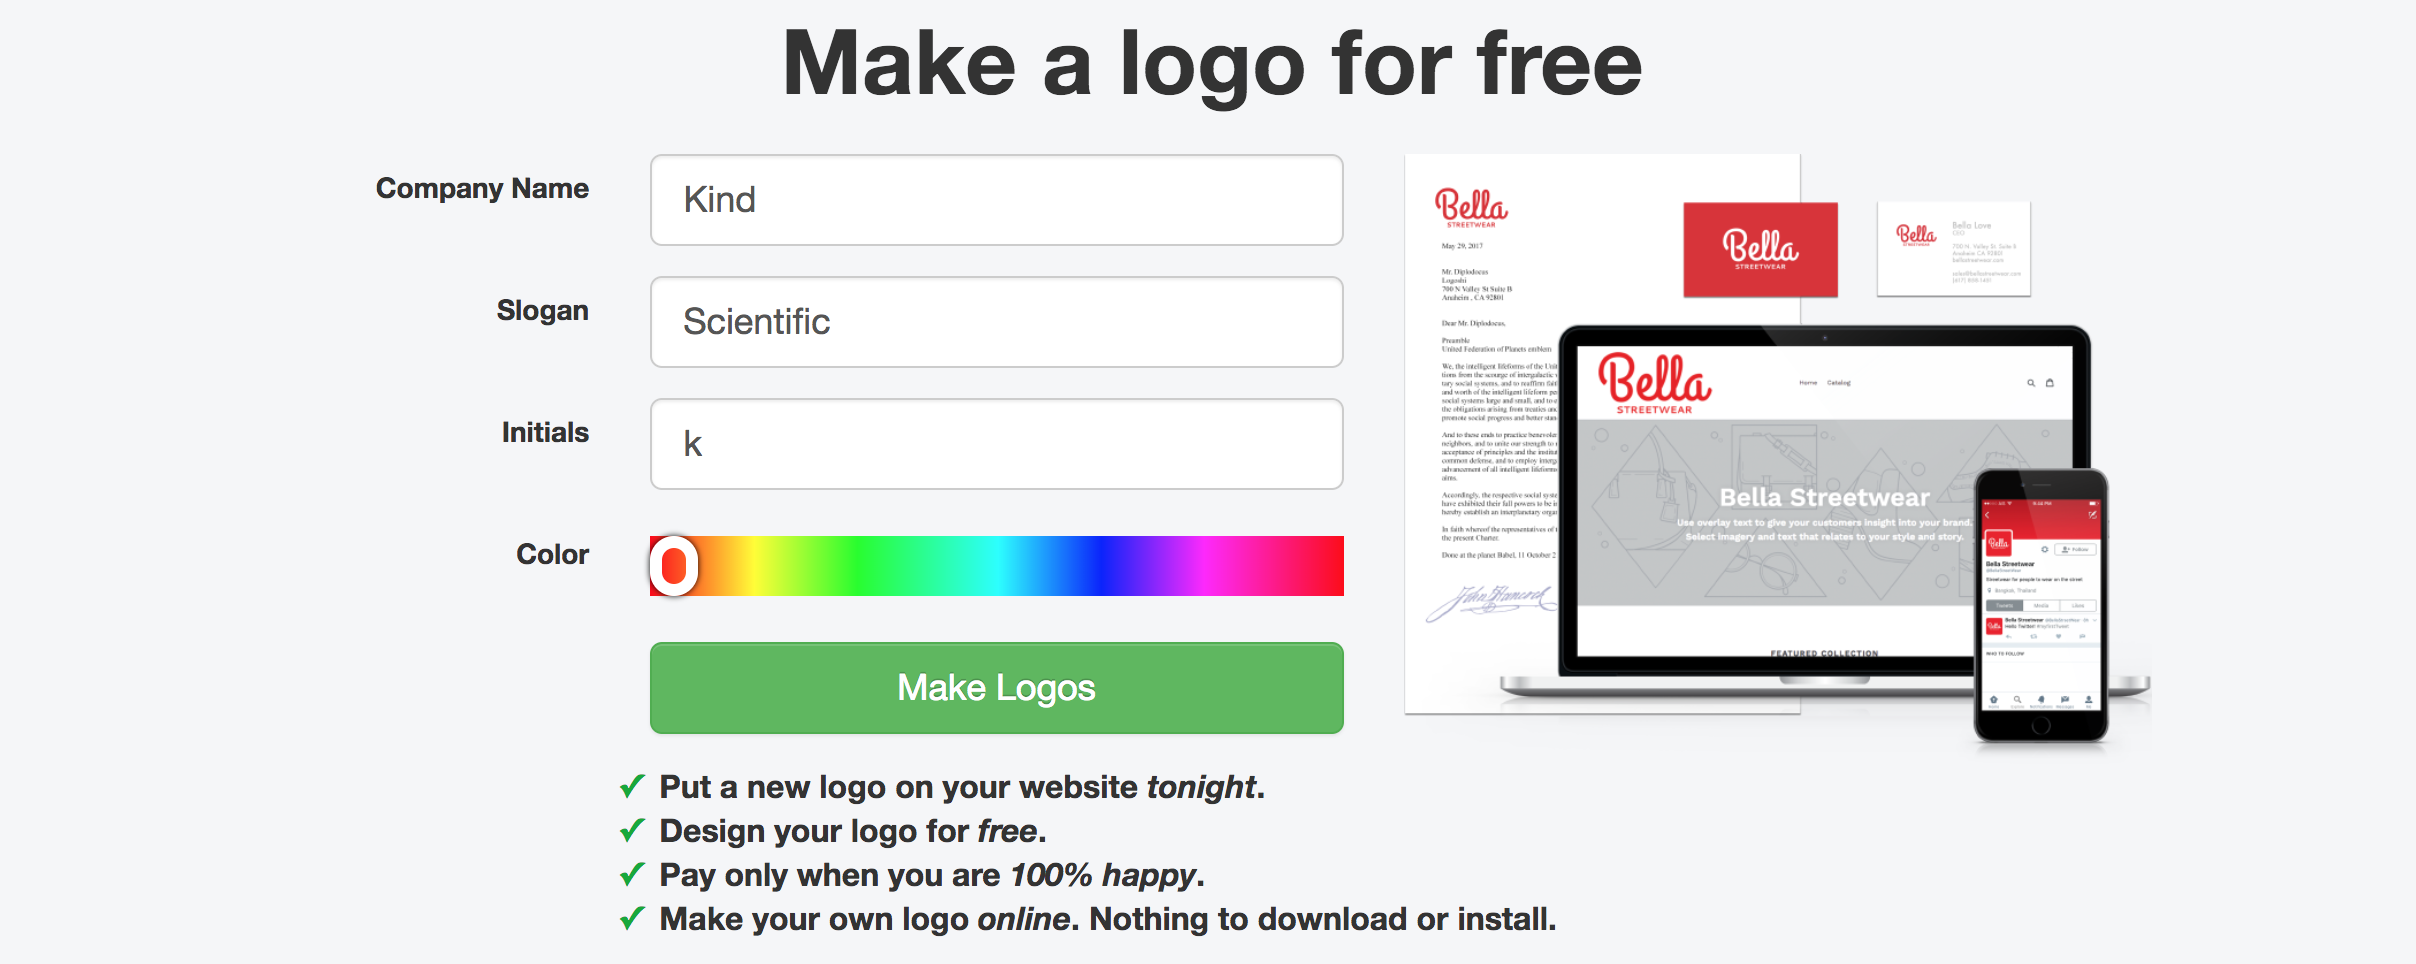 Logoshi logo design tool